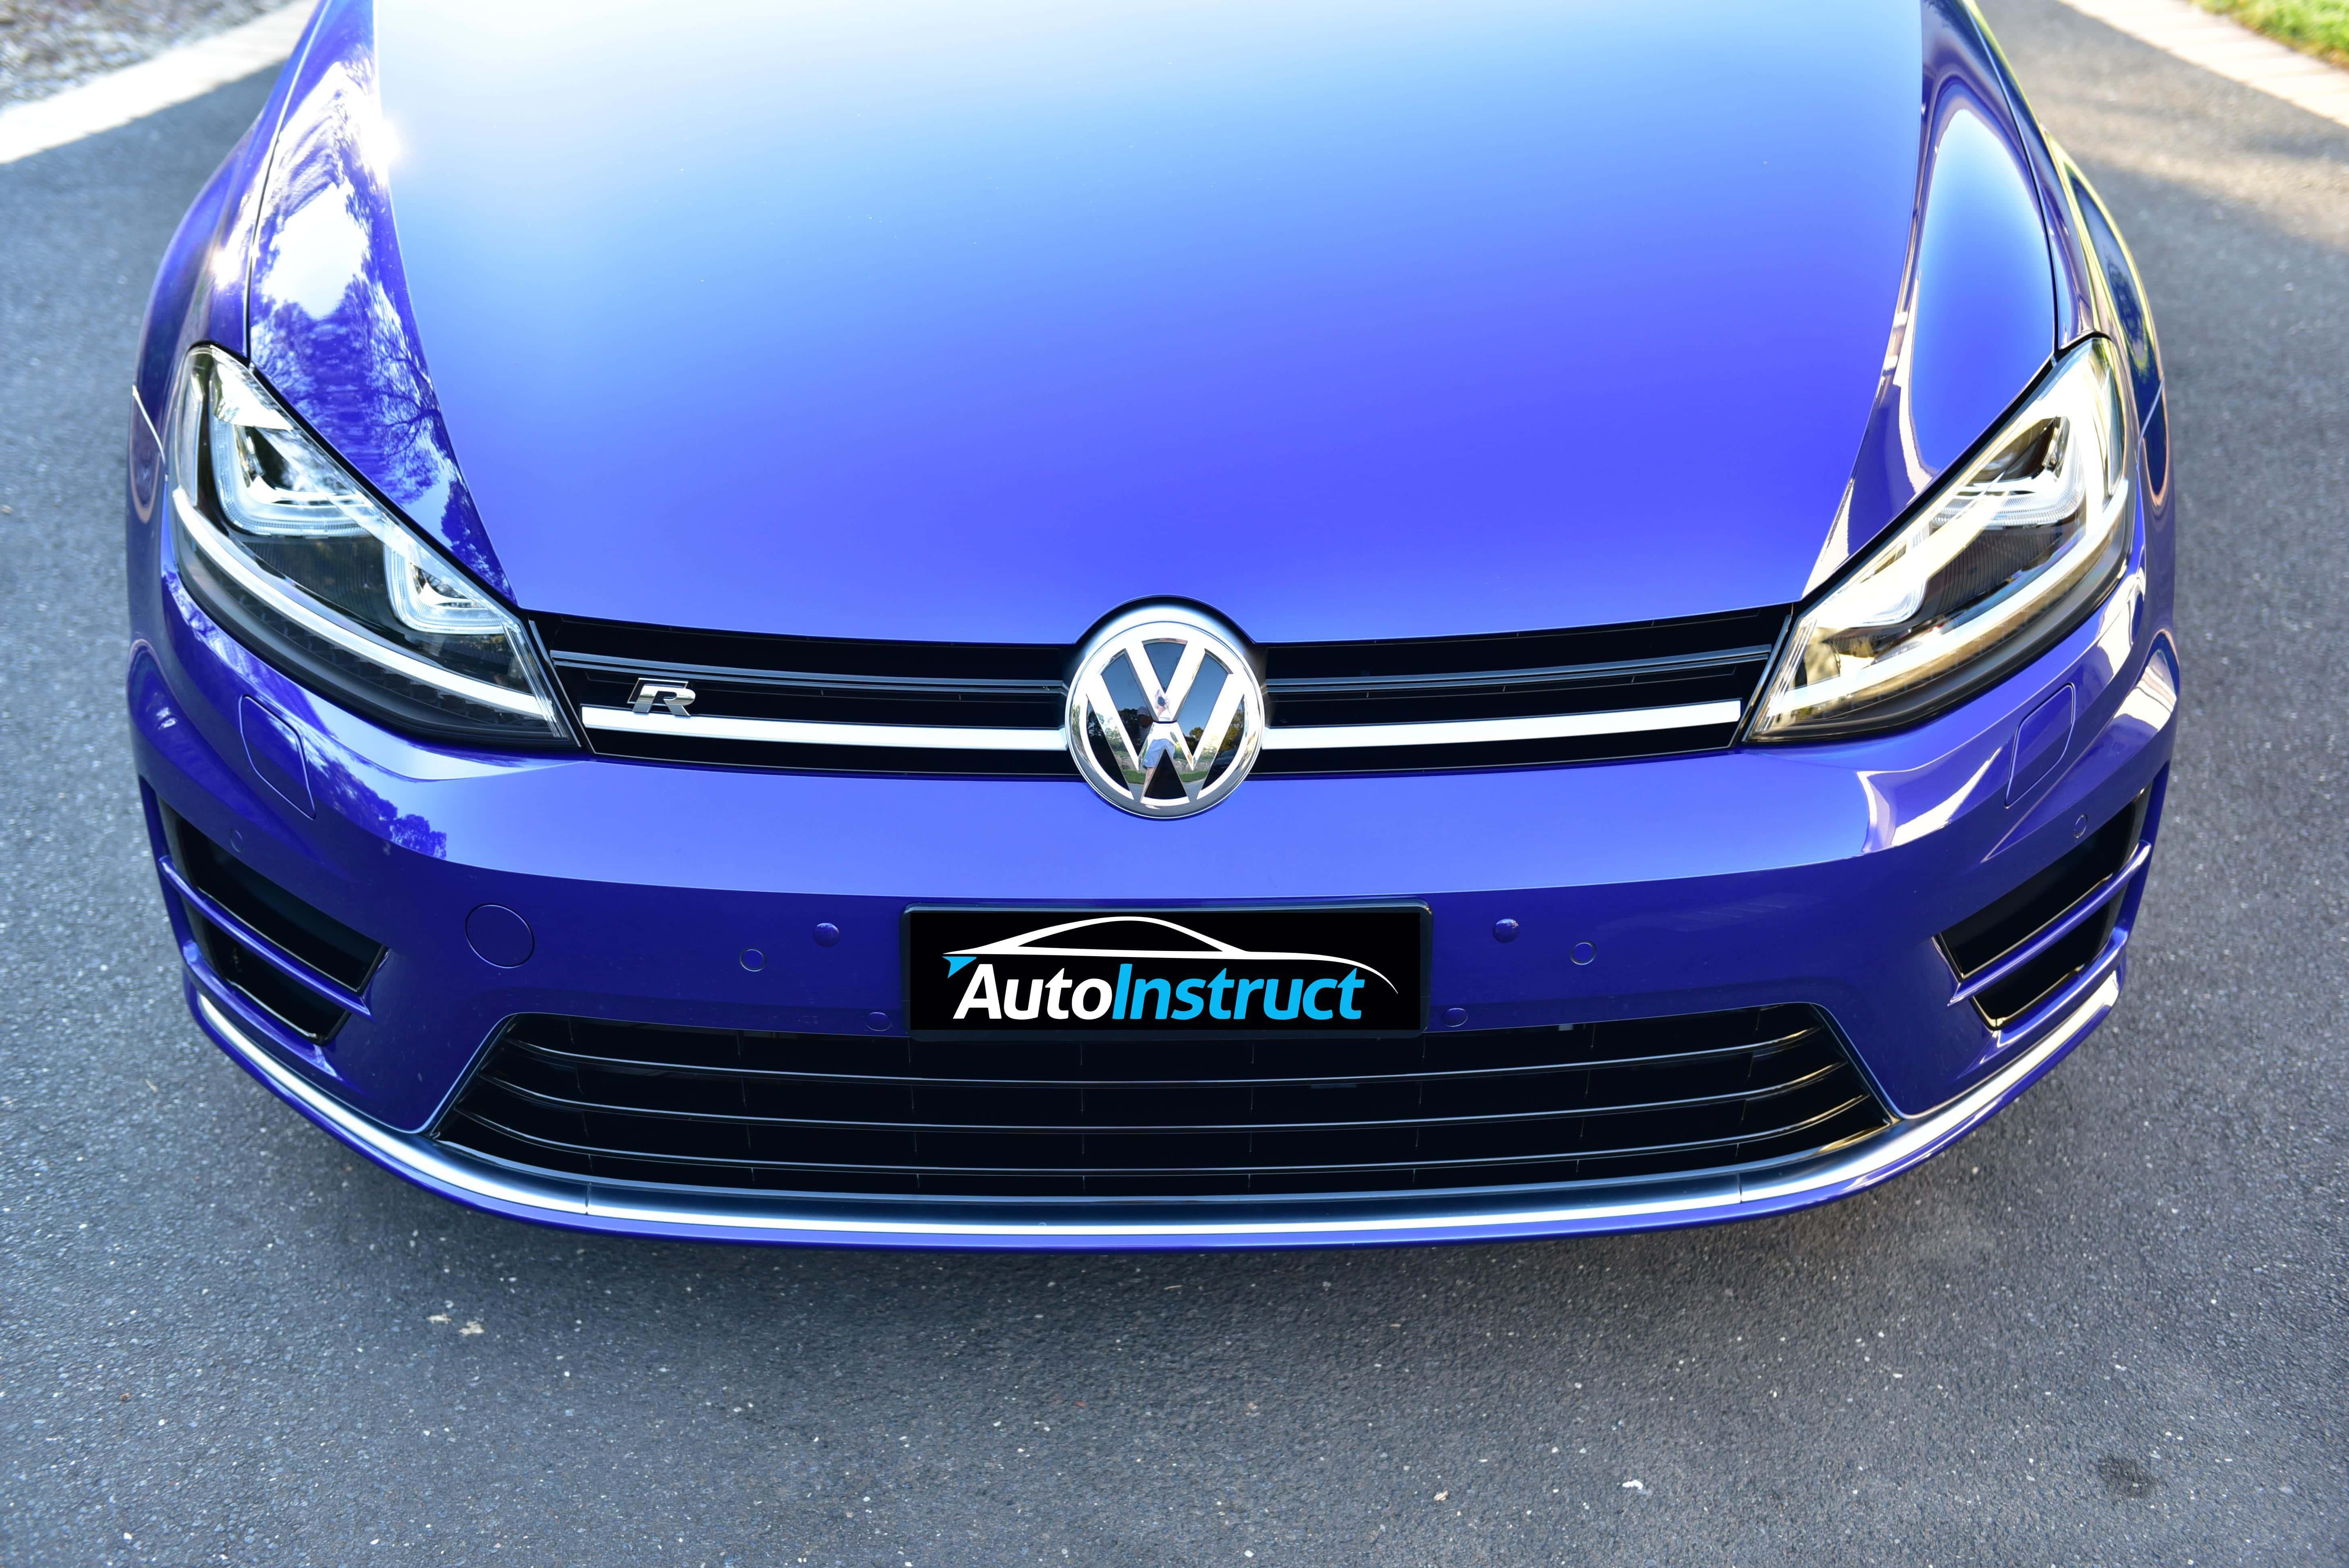 Volkswagen MK7 Golf OBDeleven / VCDS Tweaks List – AutoInstruct